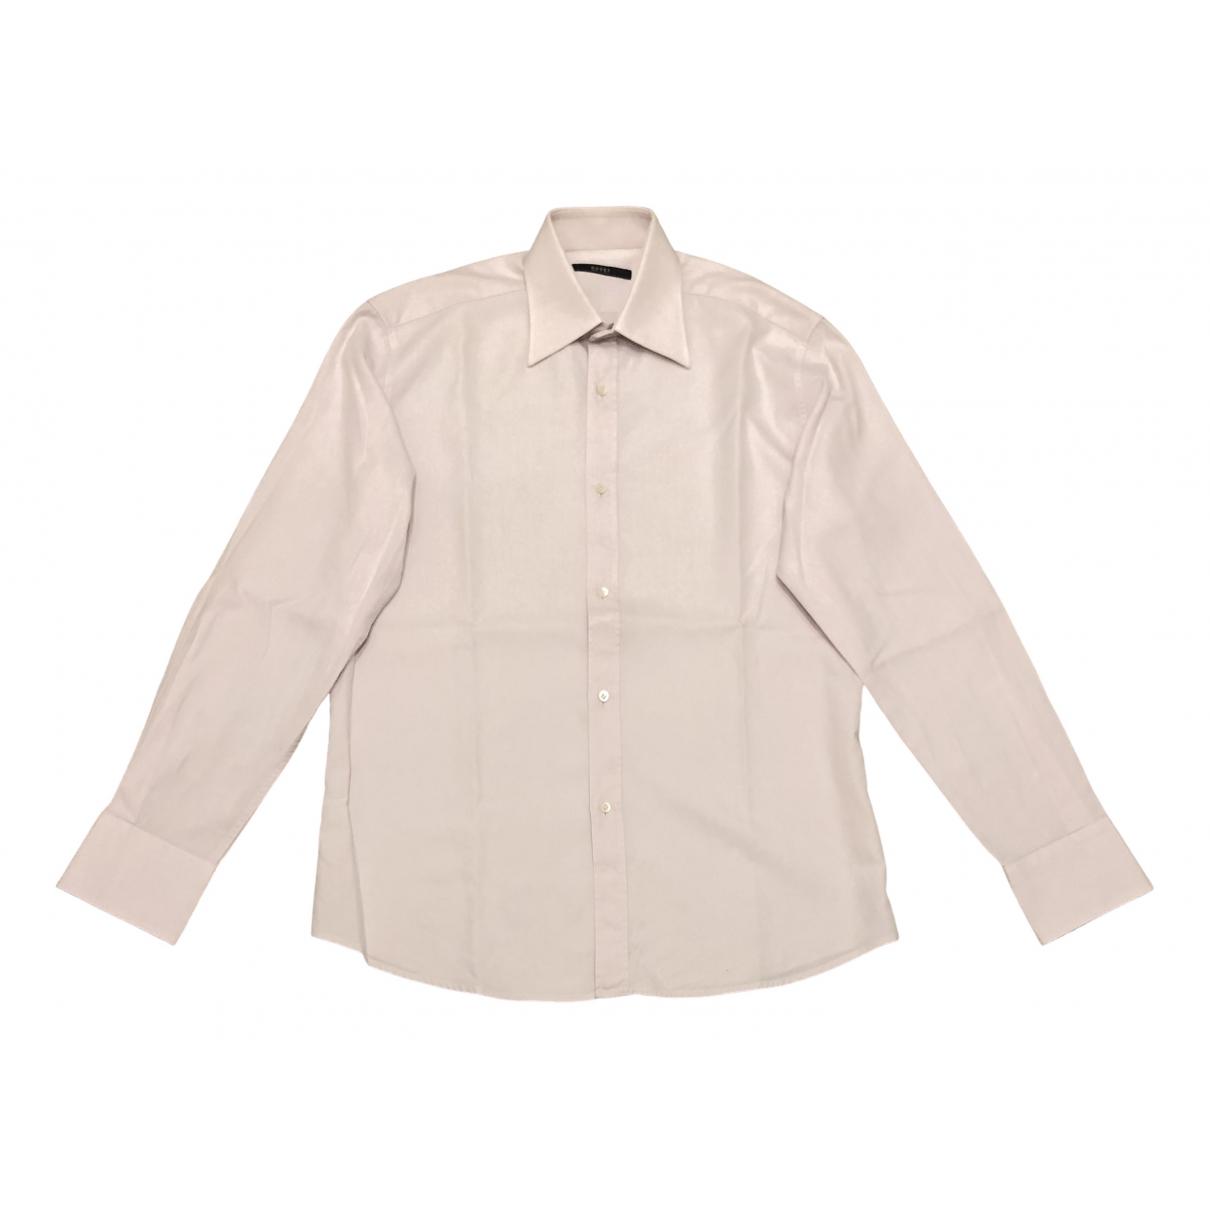 Gucci \N Pink Cotton Shirts for Men 39 EU (tour de cou / collar)